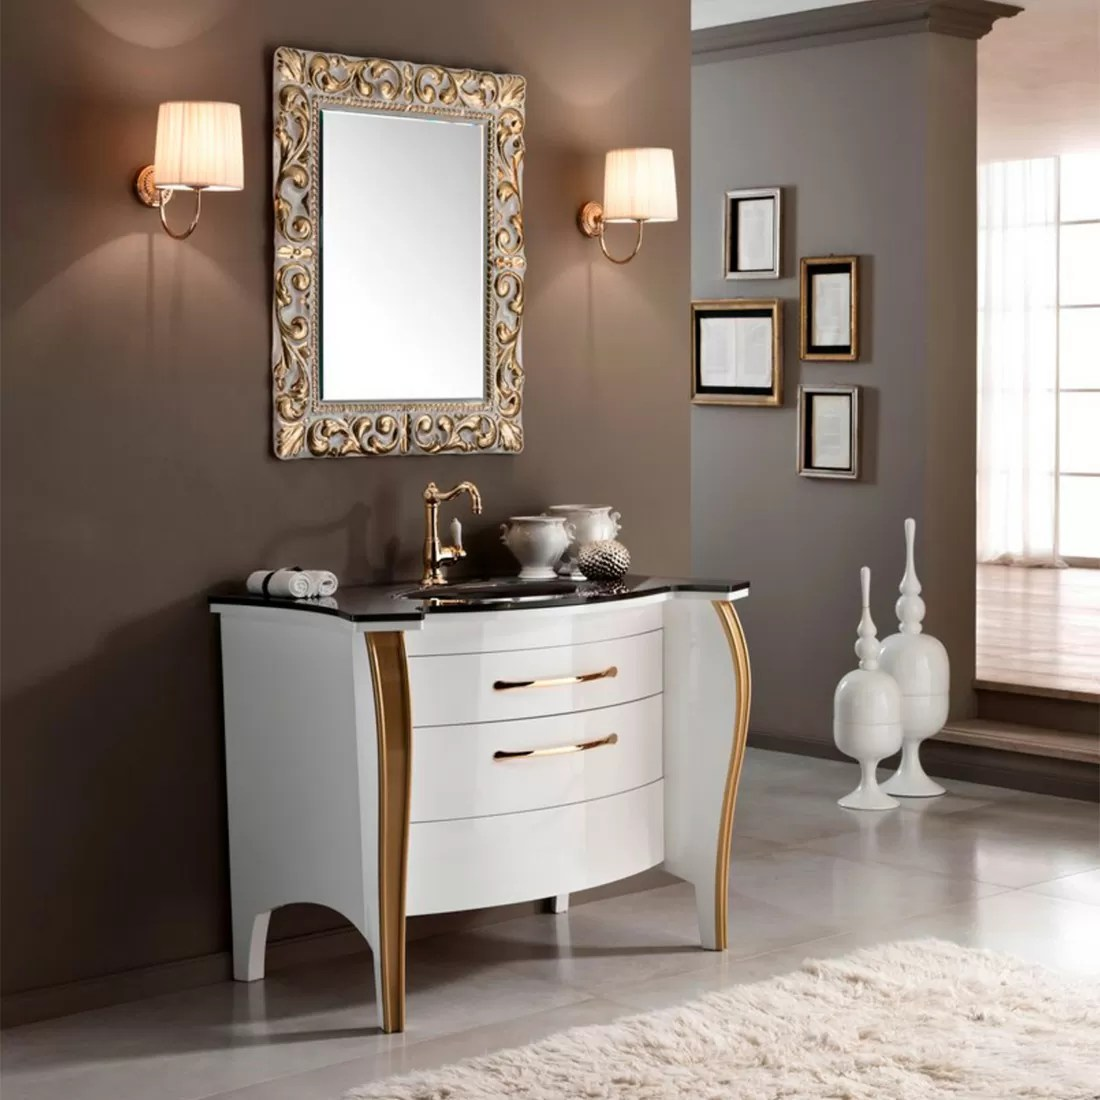 Mia Italia Belvedere 05 48 Unique Bathroom Vanity Glass Brown Top